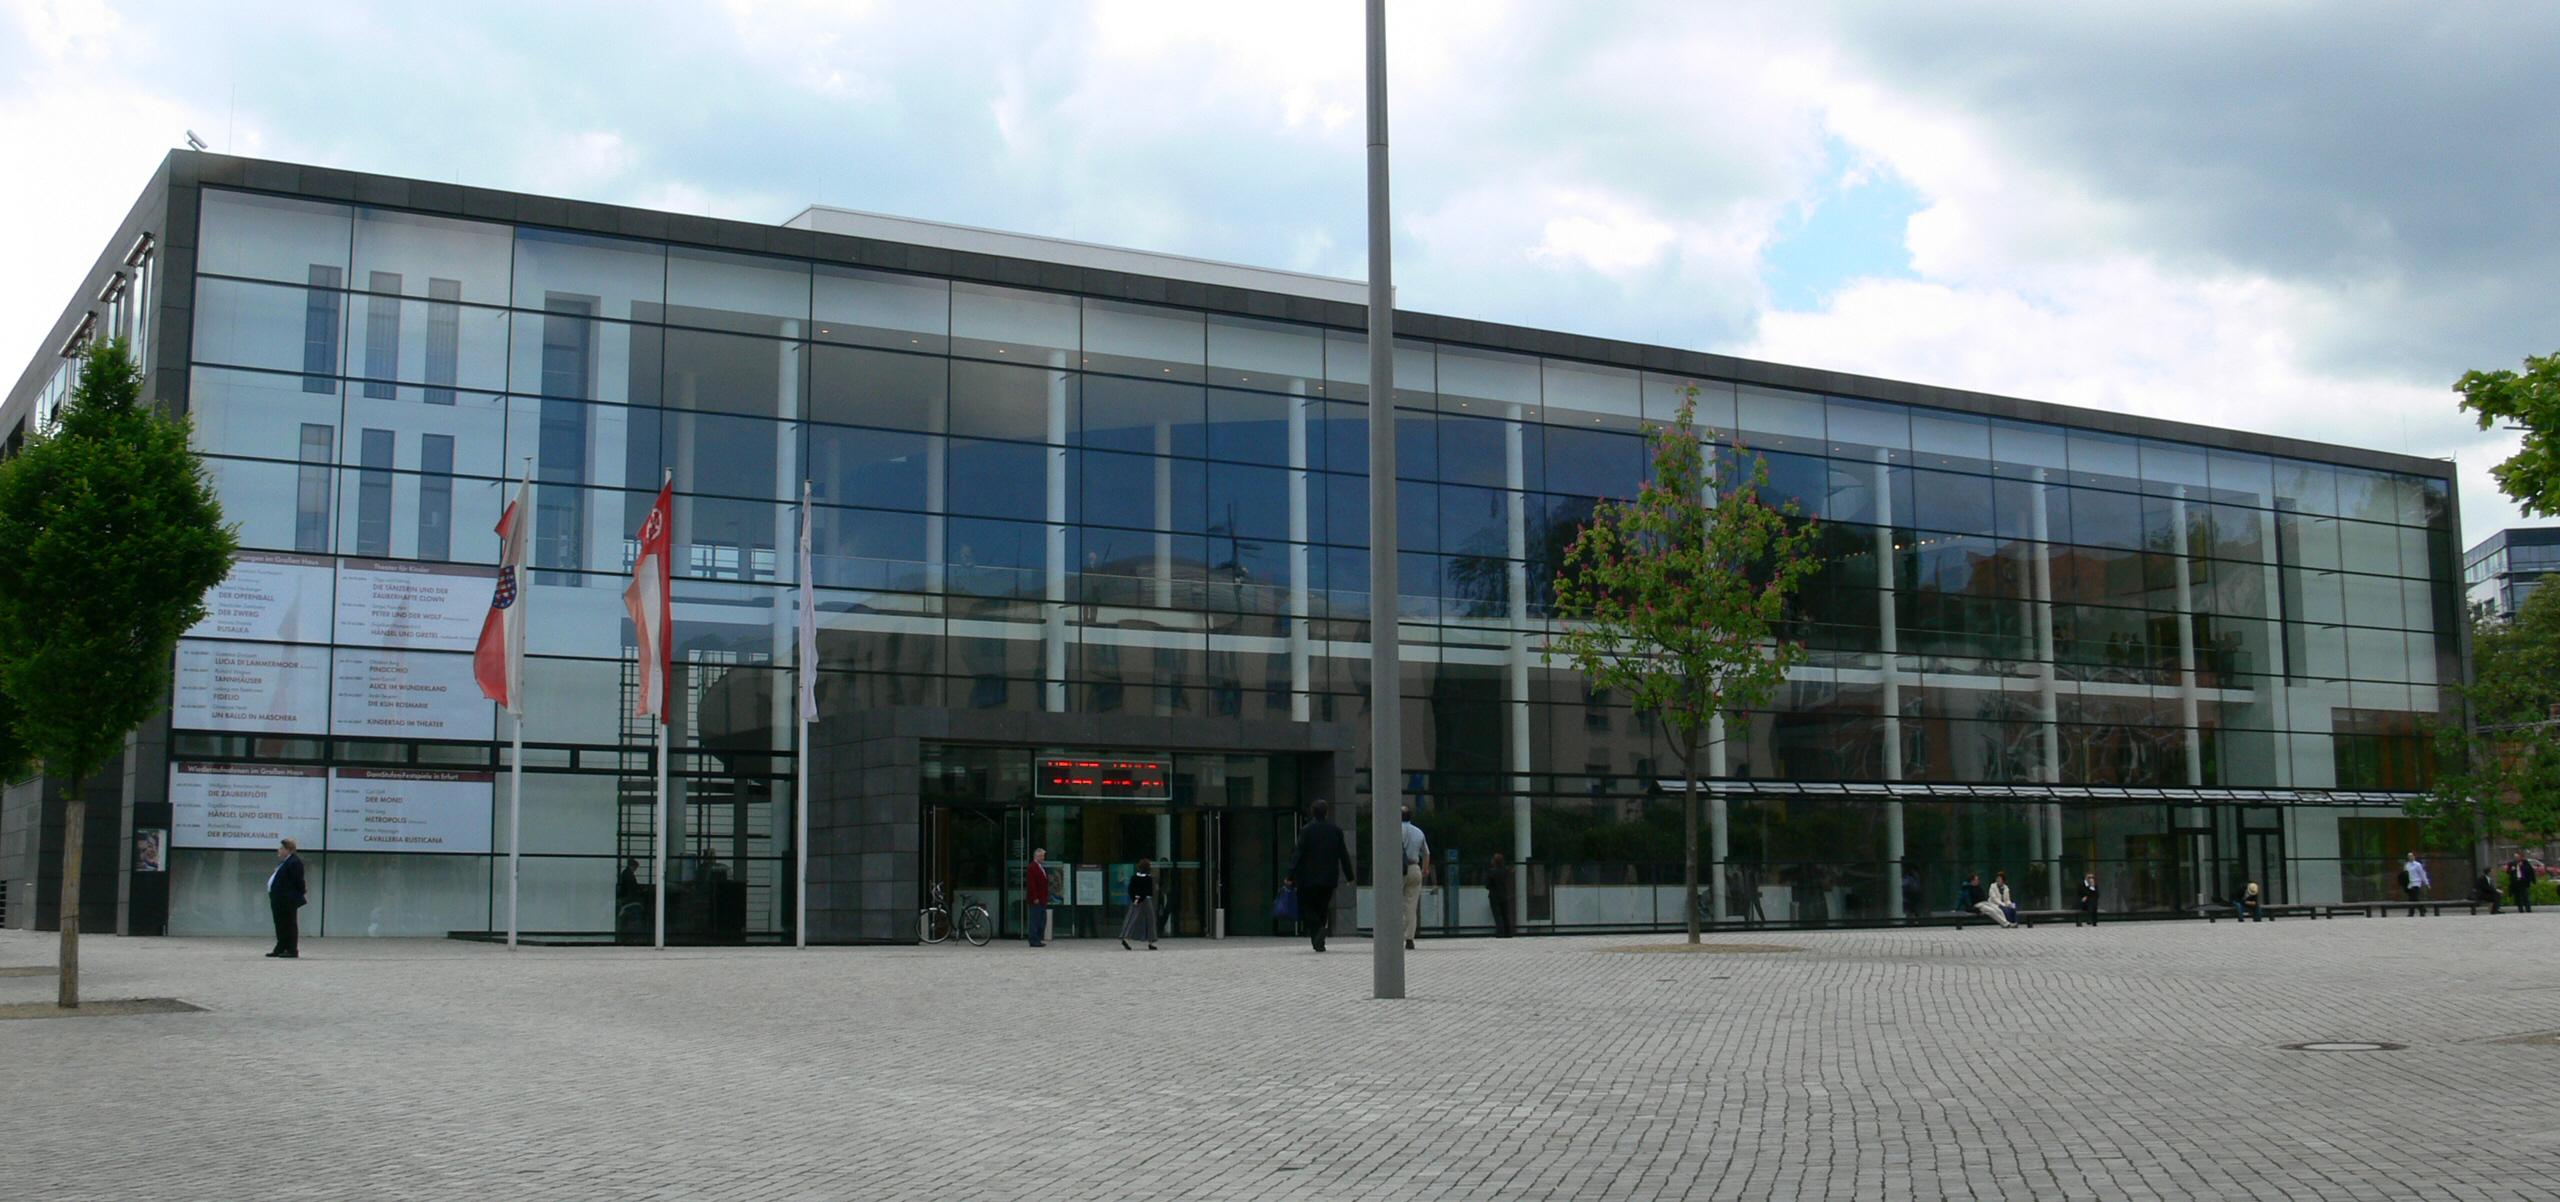 Theaterplatz 2 Erfurt